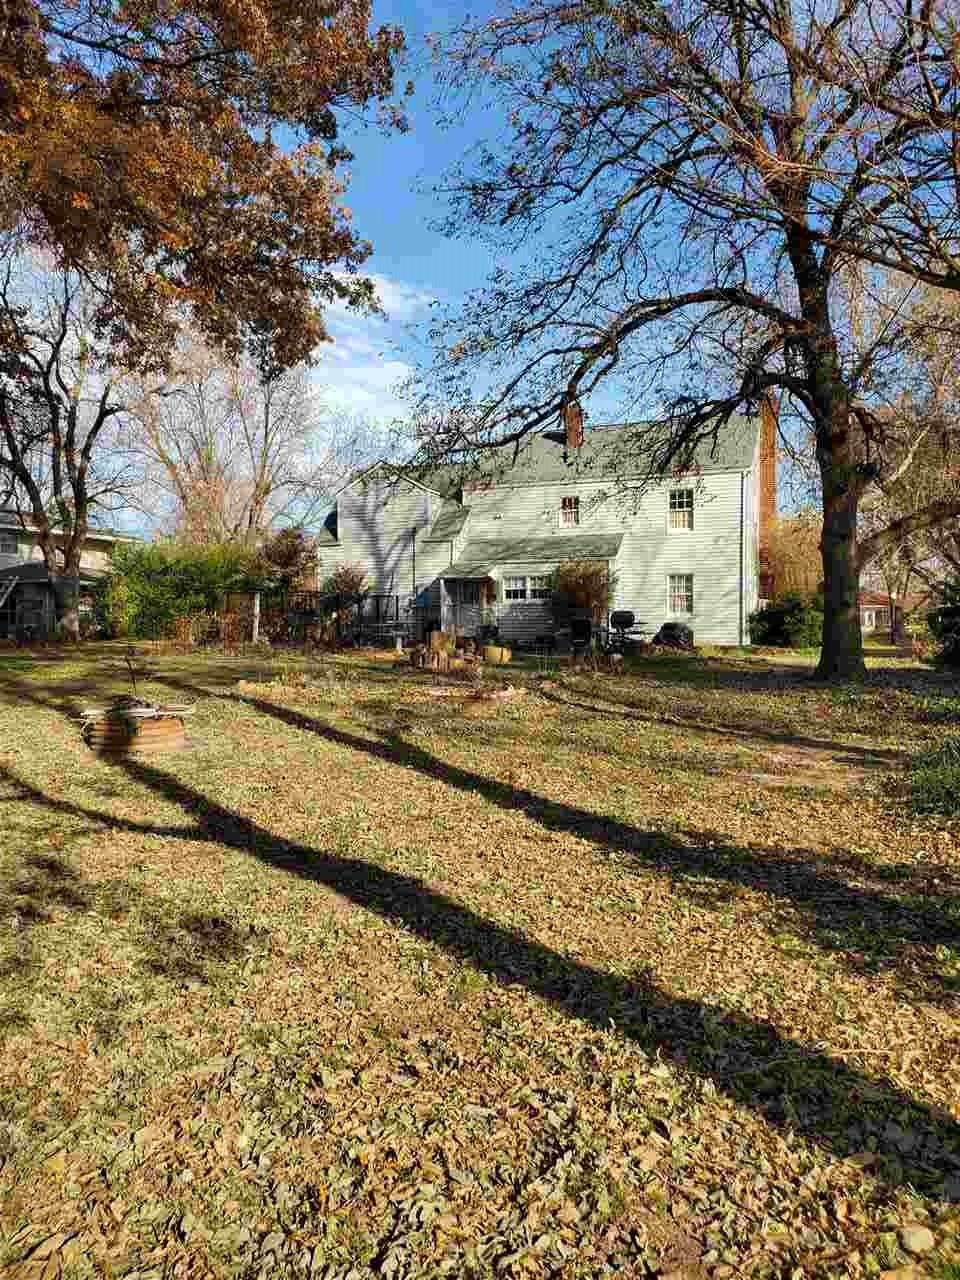 #century21groupone,#homesforsaleponcacity,#poncacityrealestate | 1106 S 7th Street  Ponca City, OK 74601-0 4